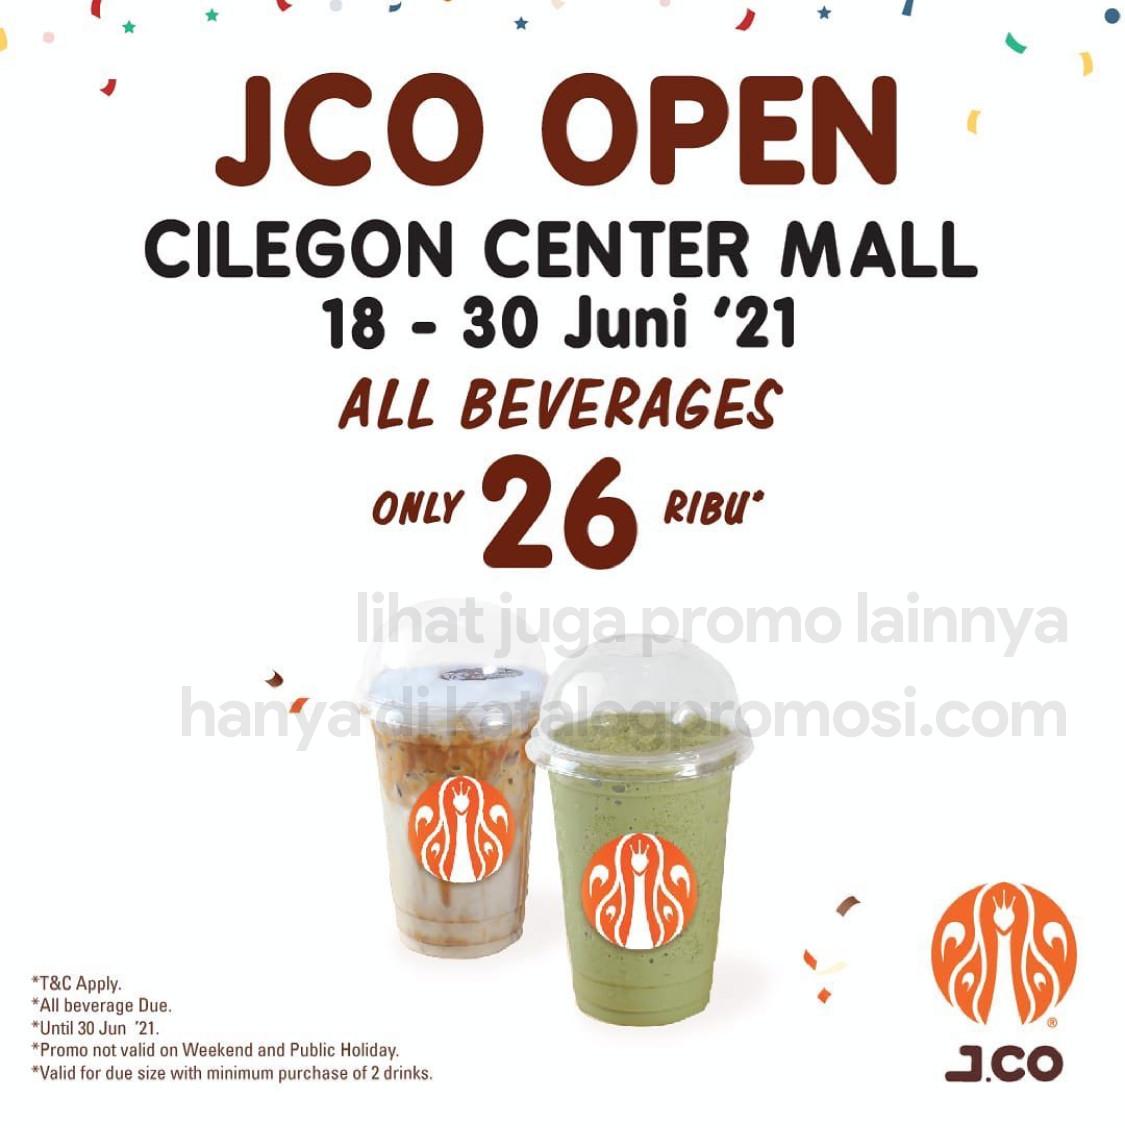 JCO CILEGON CENTER MALL Opening Promo - Semua Minuman Ukuran Due cuma Rp. 26.000 BERLAKU mulai tanggal 18-30 Juni 2021